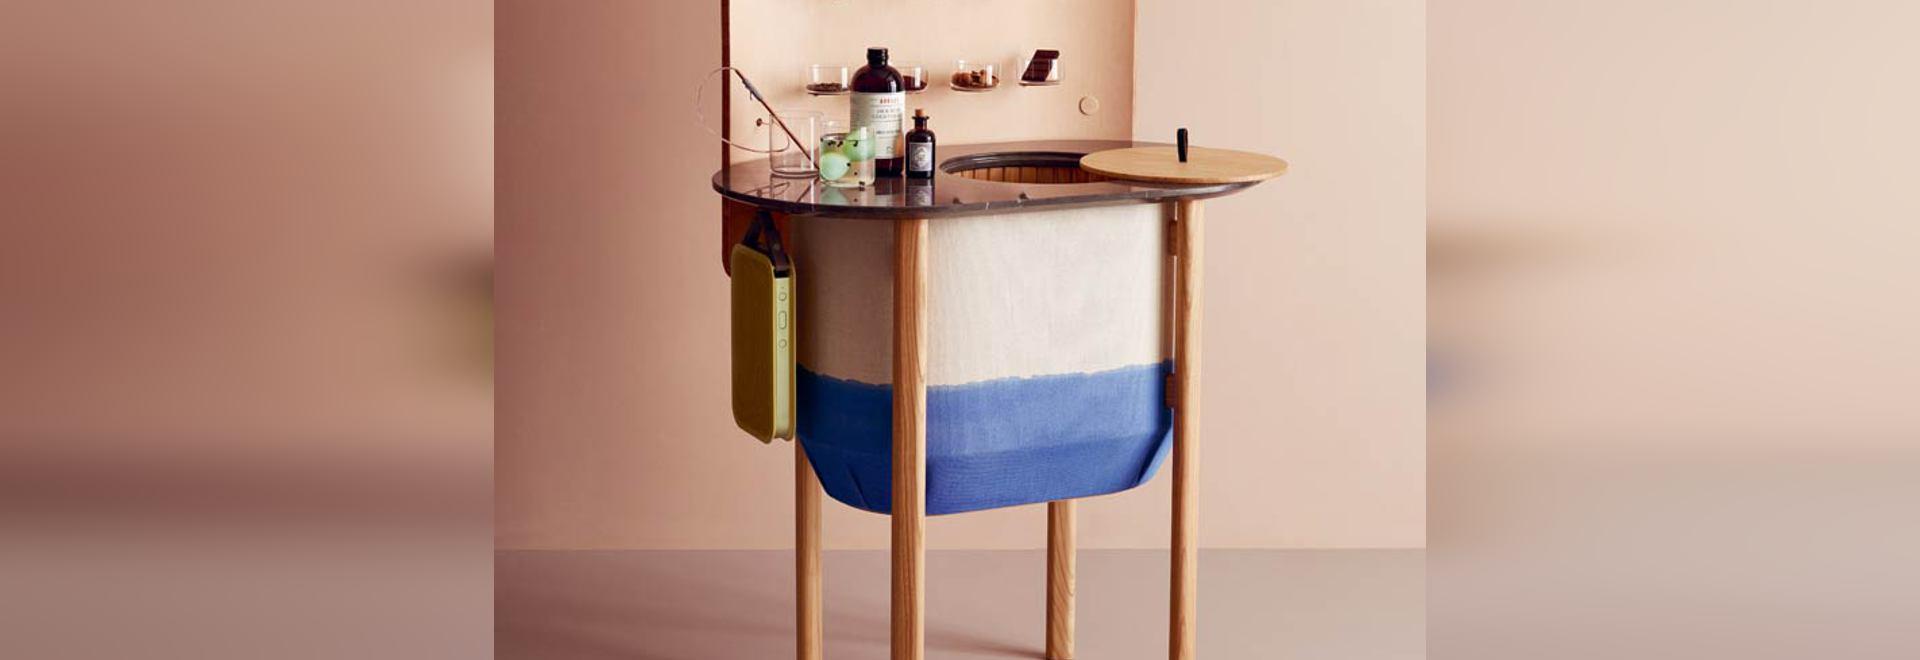 Let's Meet The Designer of The Year Maison et Objet 2018 Cecilie Manz 6